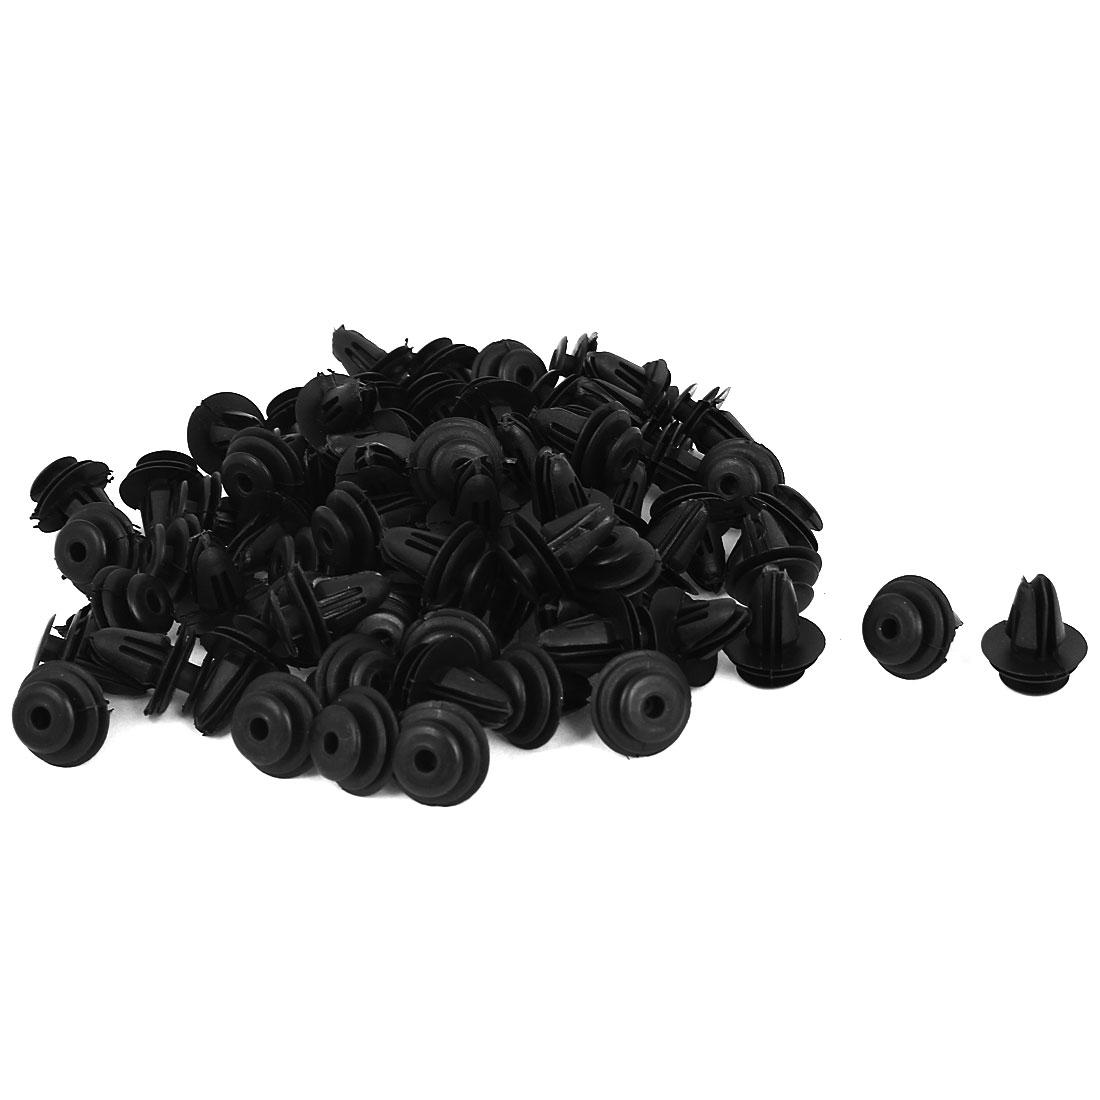 100 Pcs Black Plastic Rivet Trim Fastener Moulding Clips 9mm x 15mm x 18mm